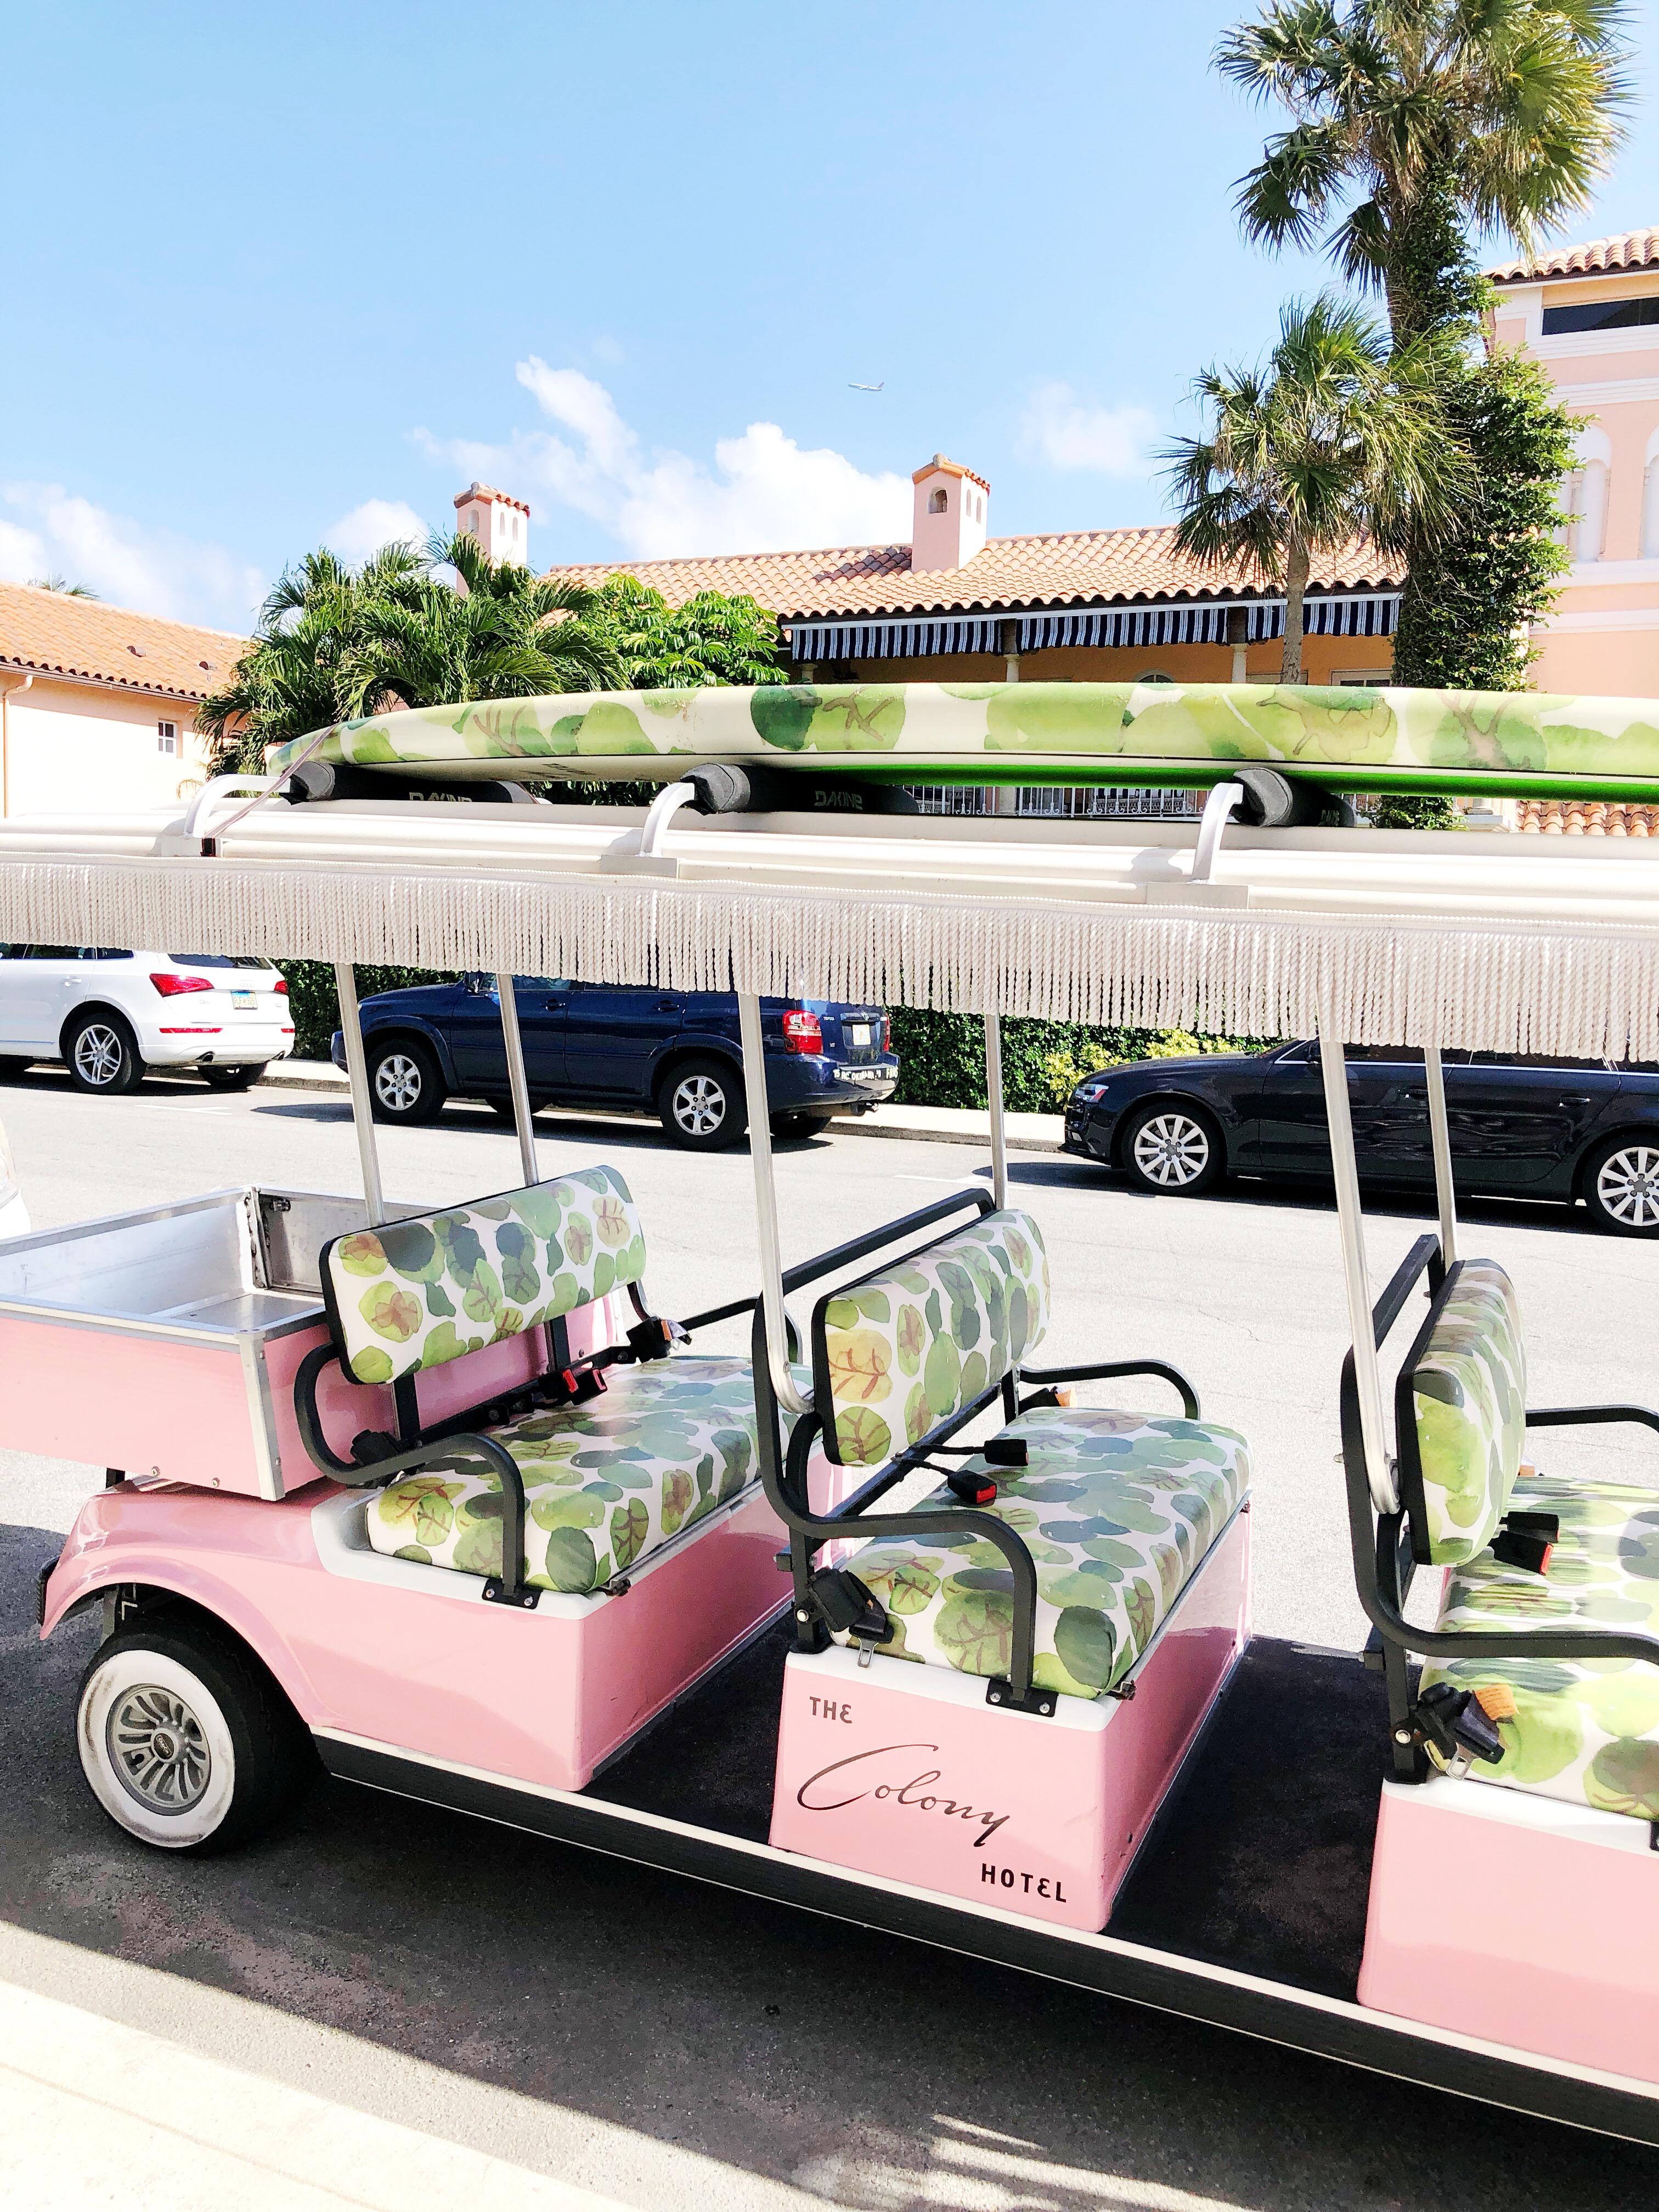 The Colony Hotel Golf Cart Palm Beach, Florida / West Palm Beach, Florida / Coastal and Beach Town - Sunshine Style